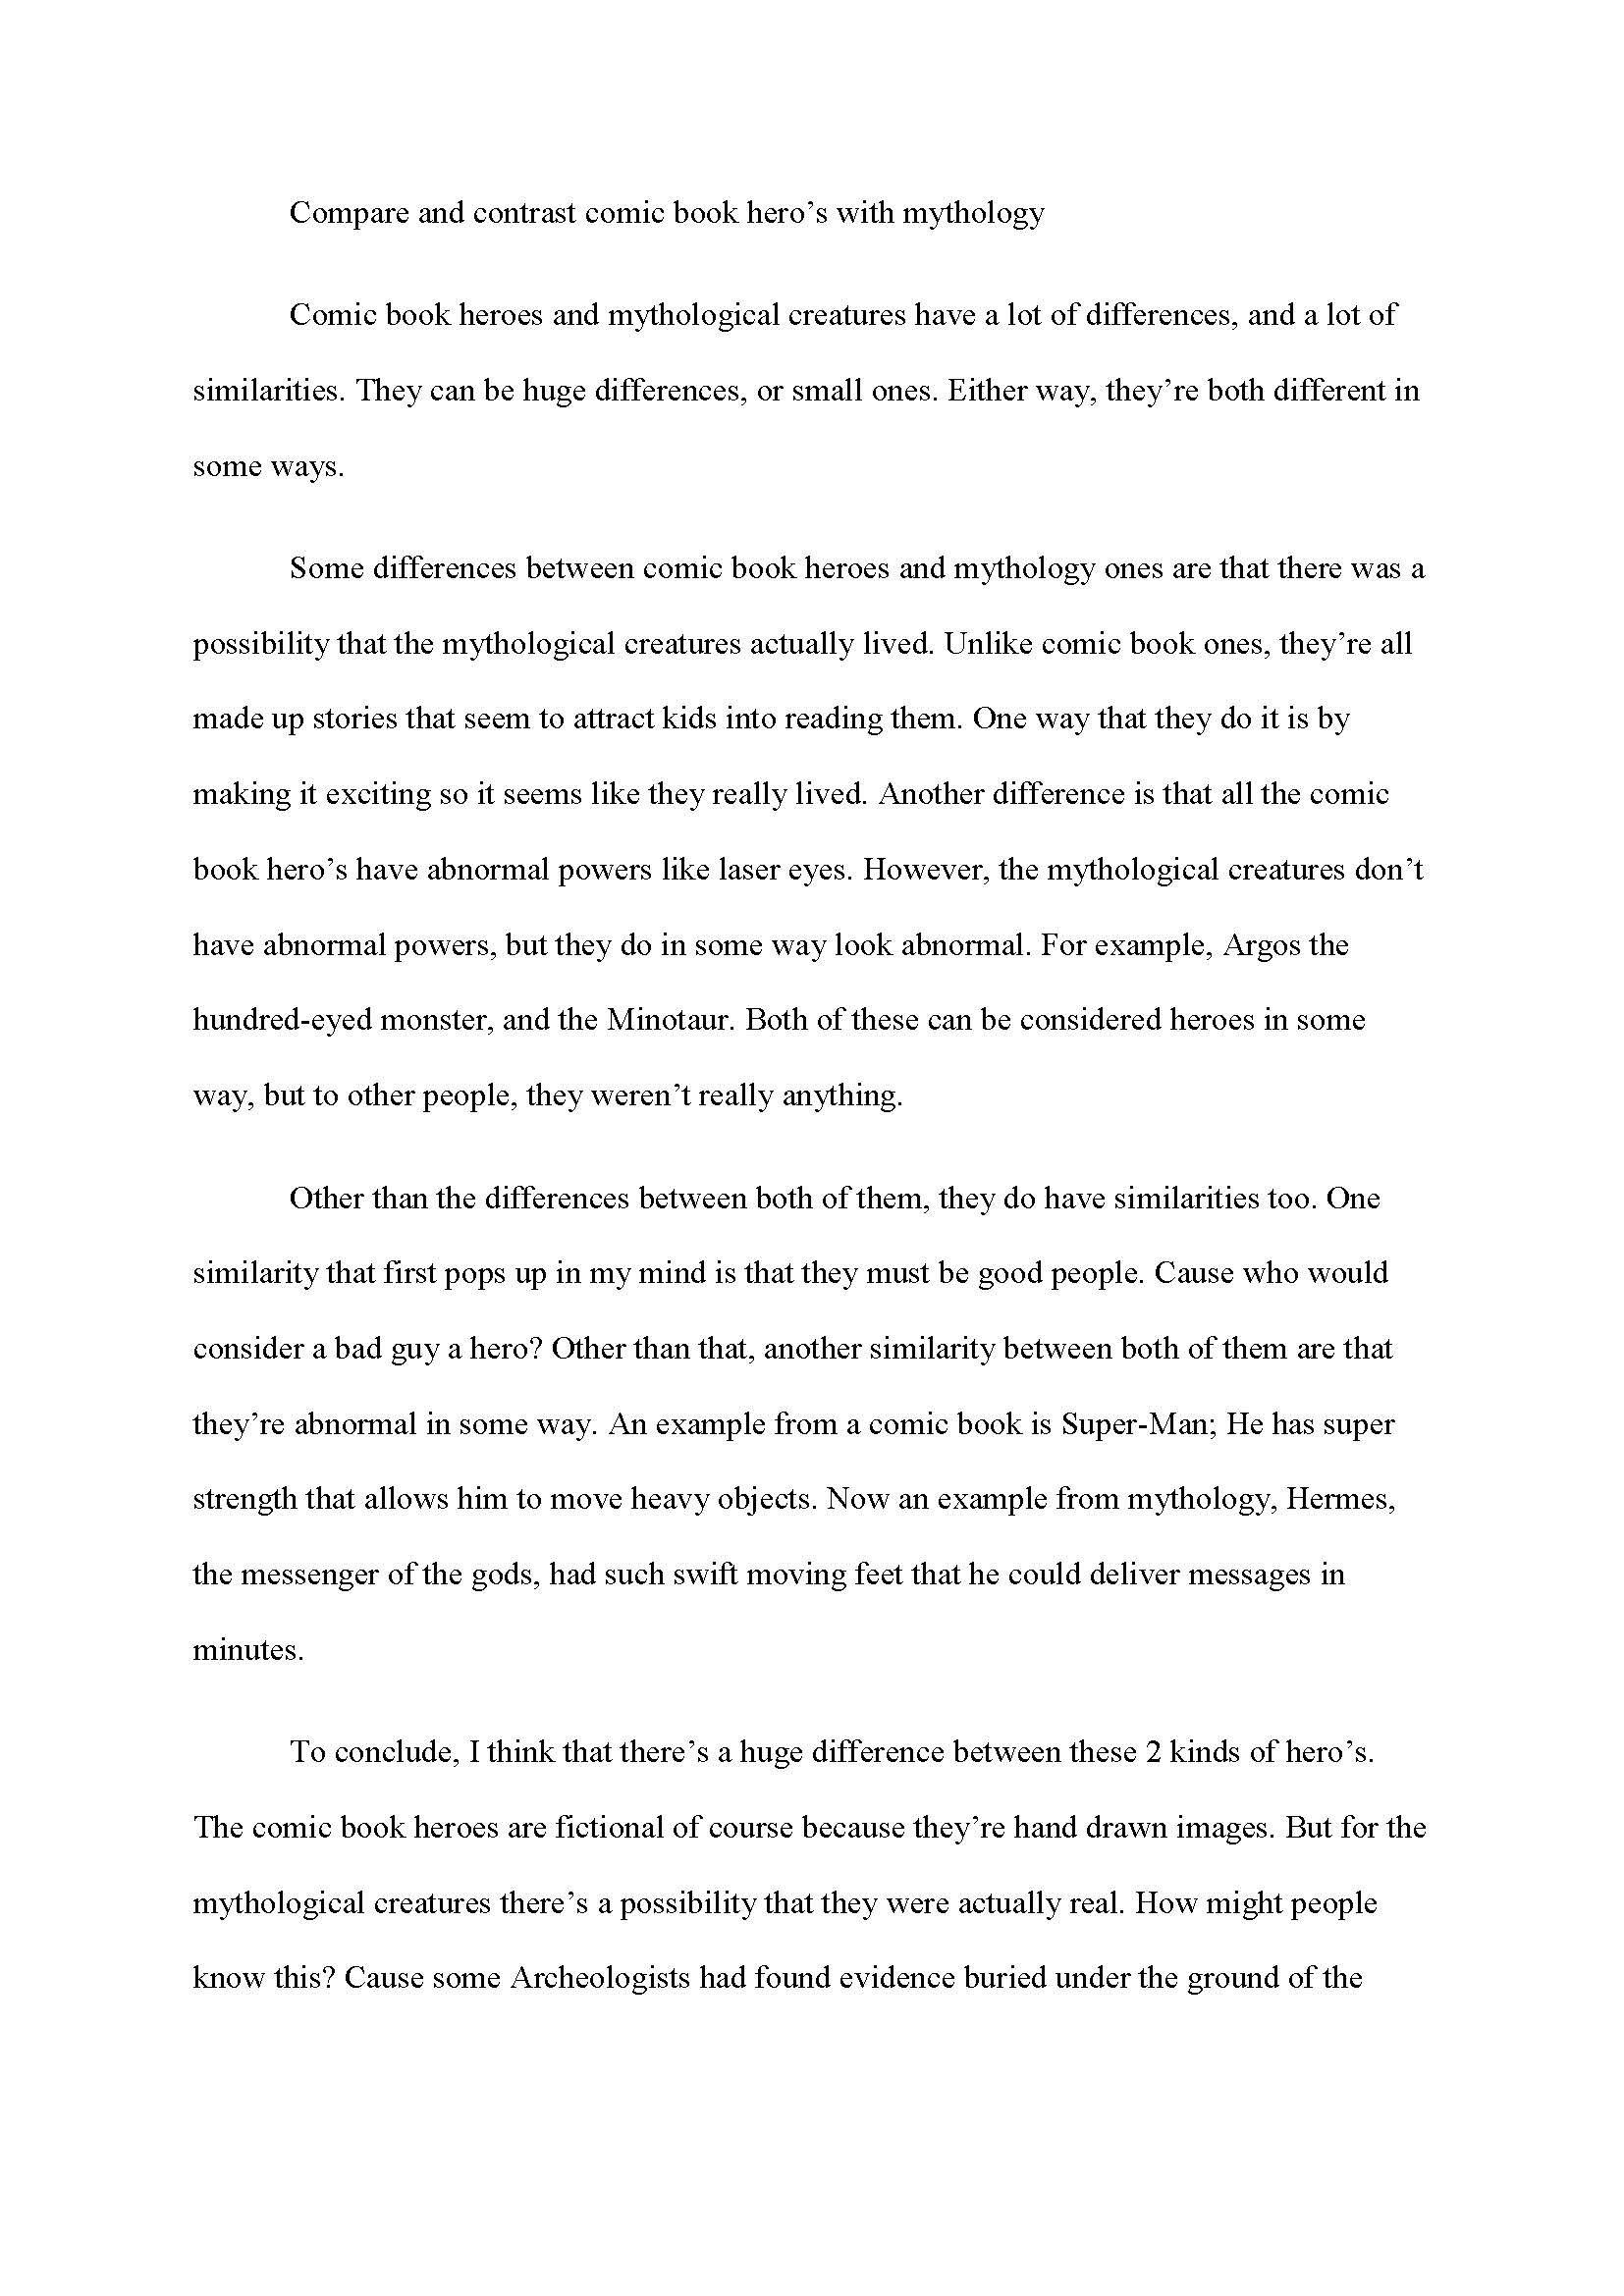 essay outline example apa